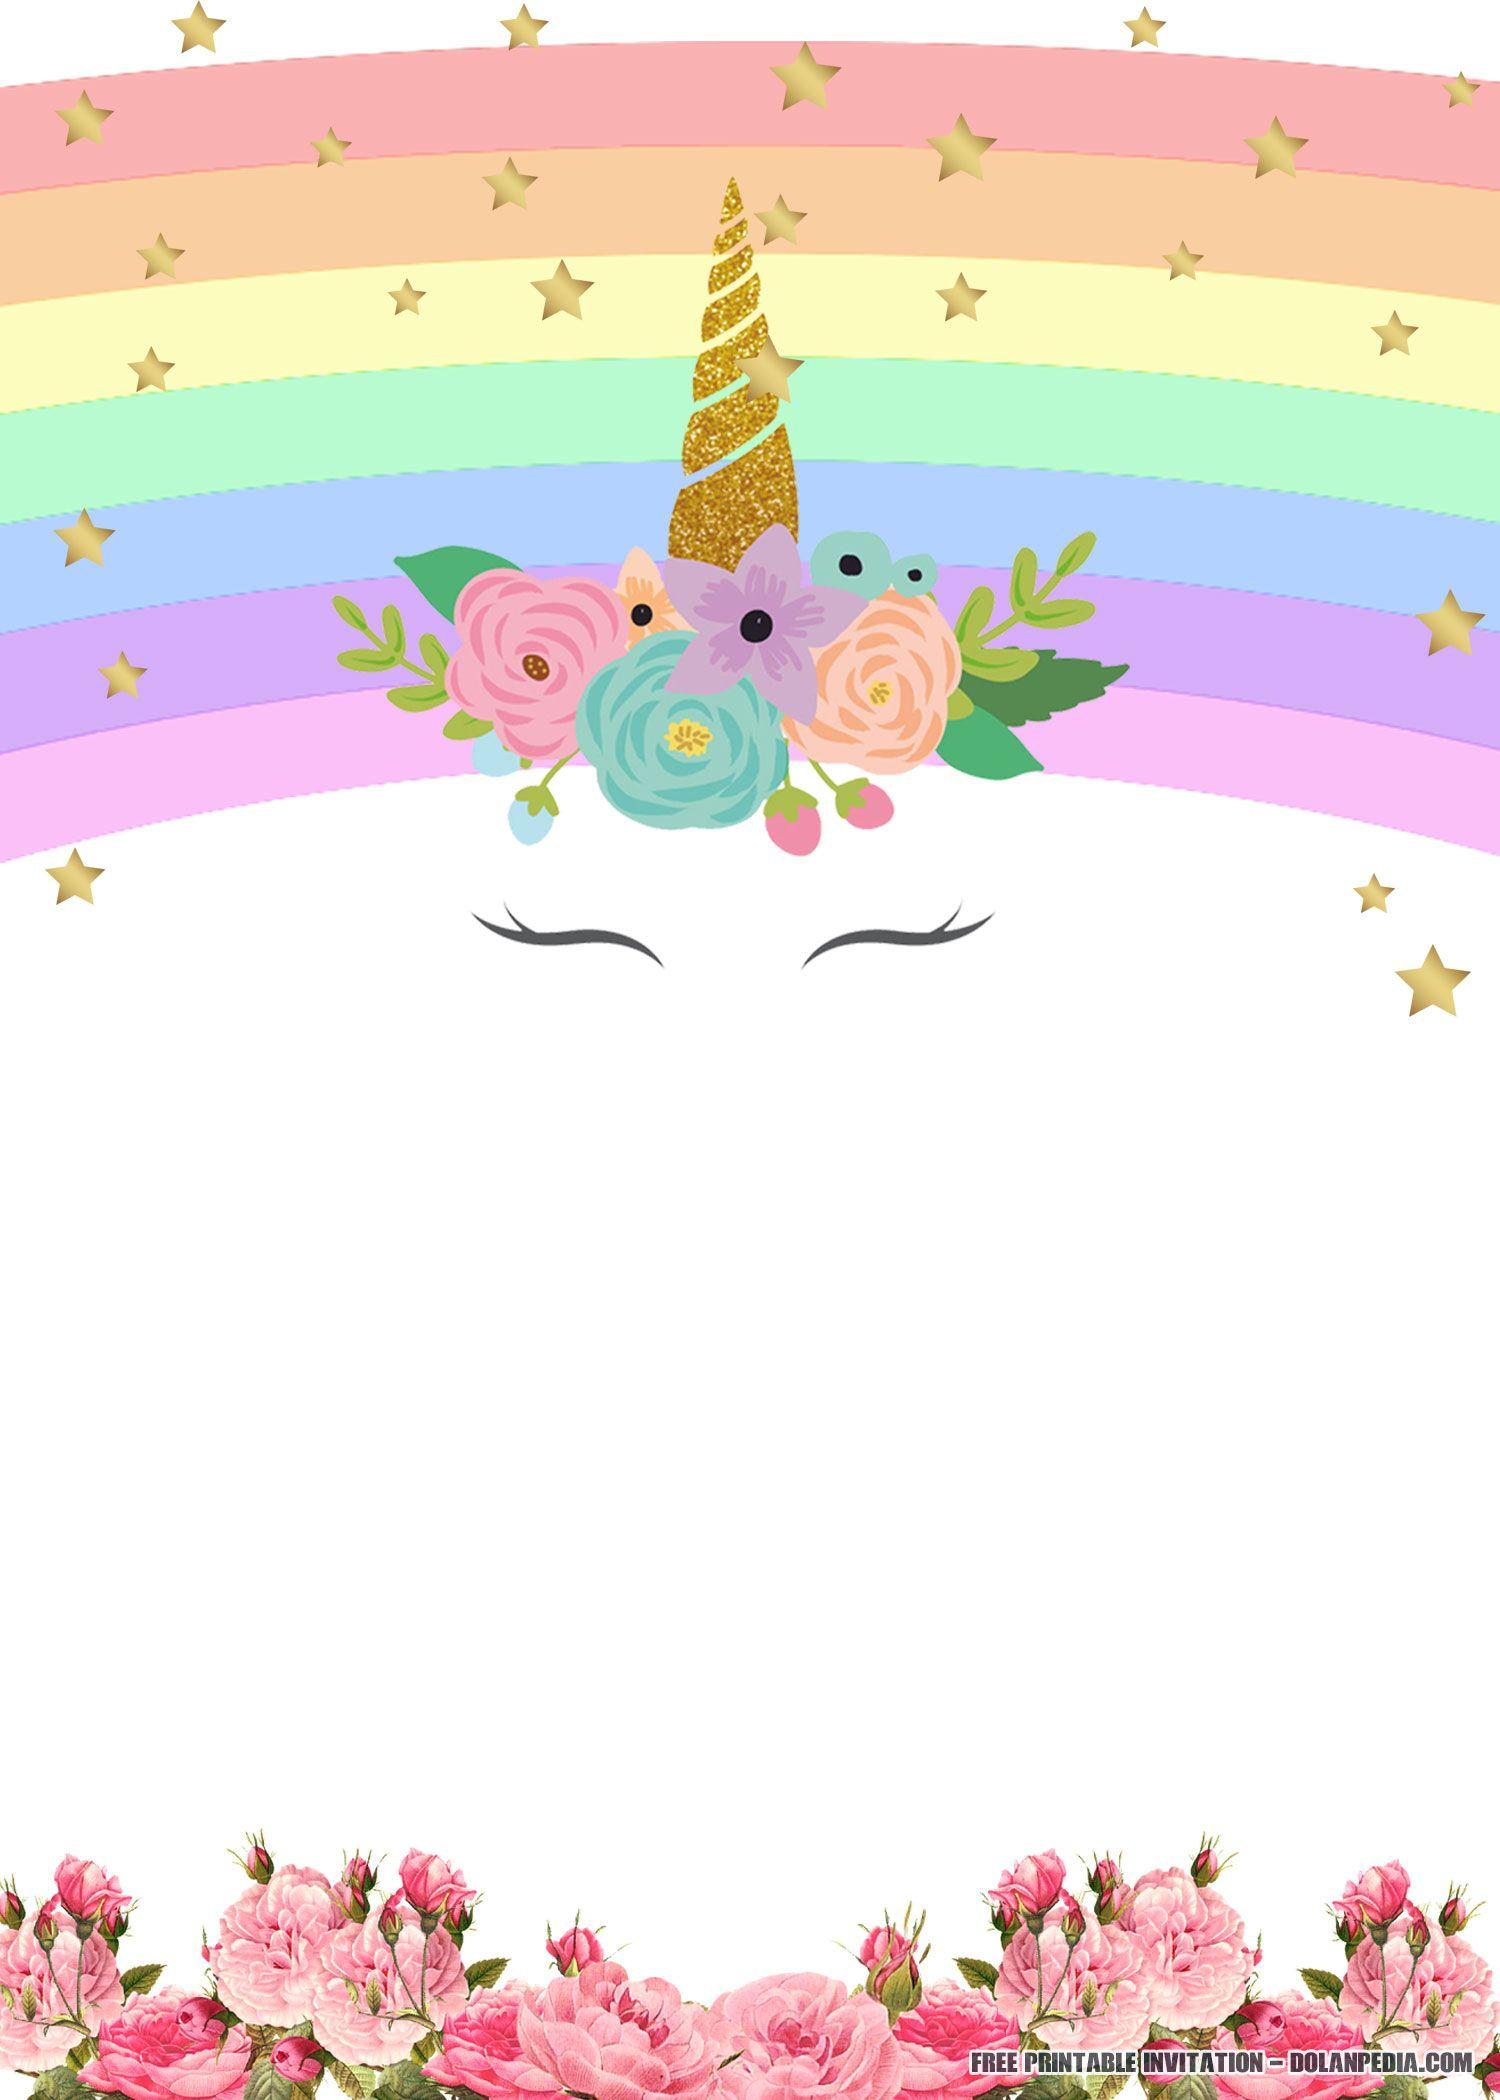 Free Printable Golden Unicorn Birthday Invitation | Unicorn - Free Printable Unicorn Invitations